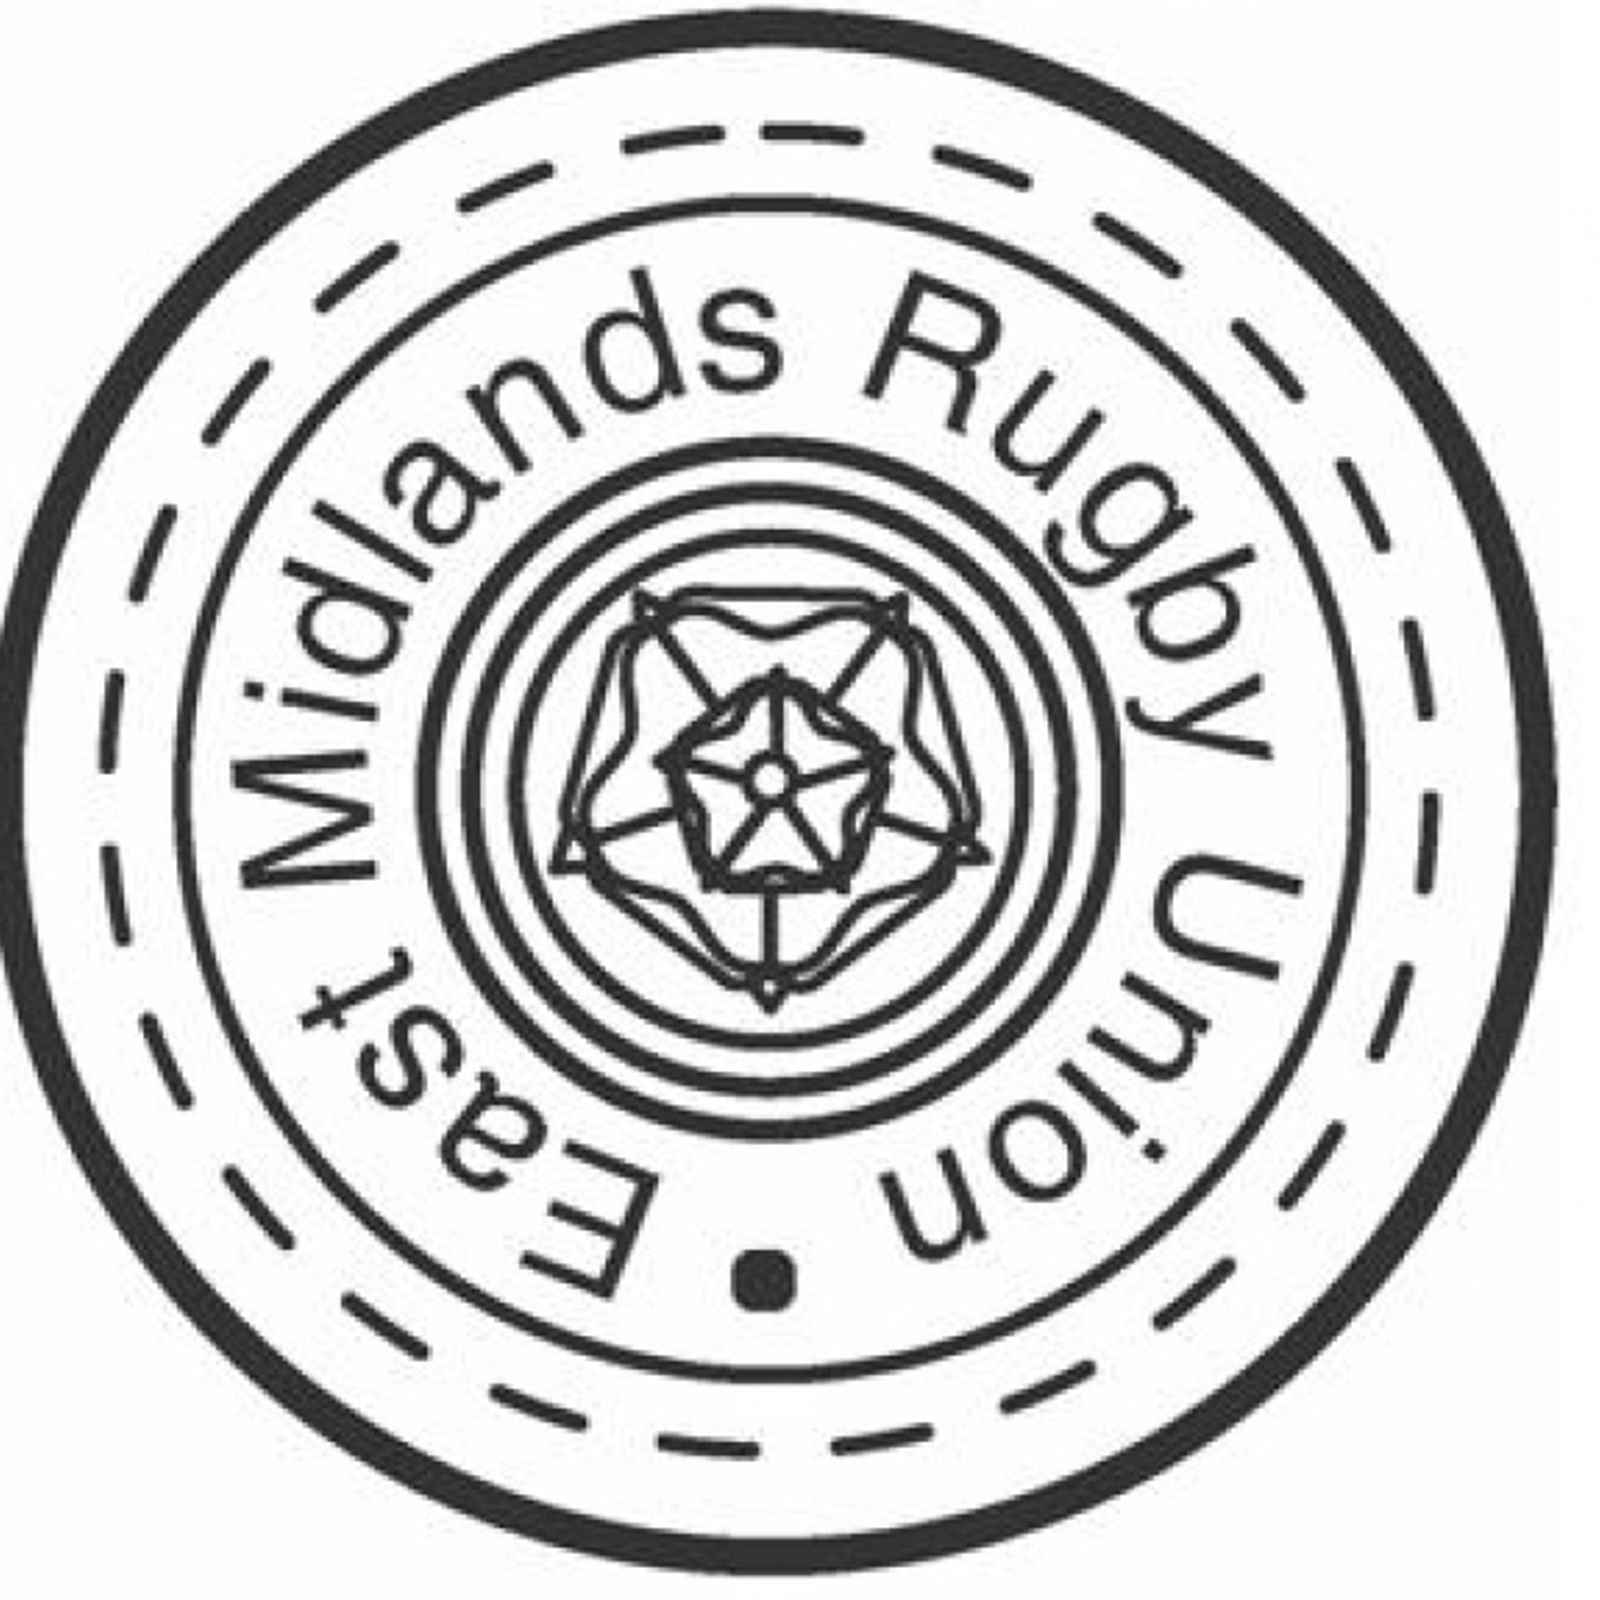 More Representative Honours for Wboro Girls Section